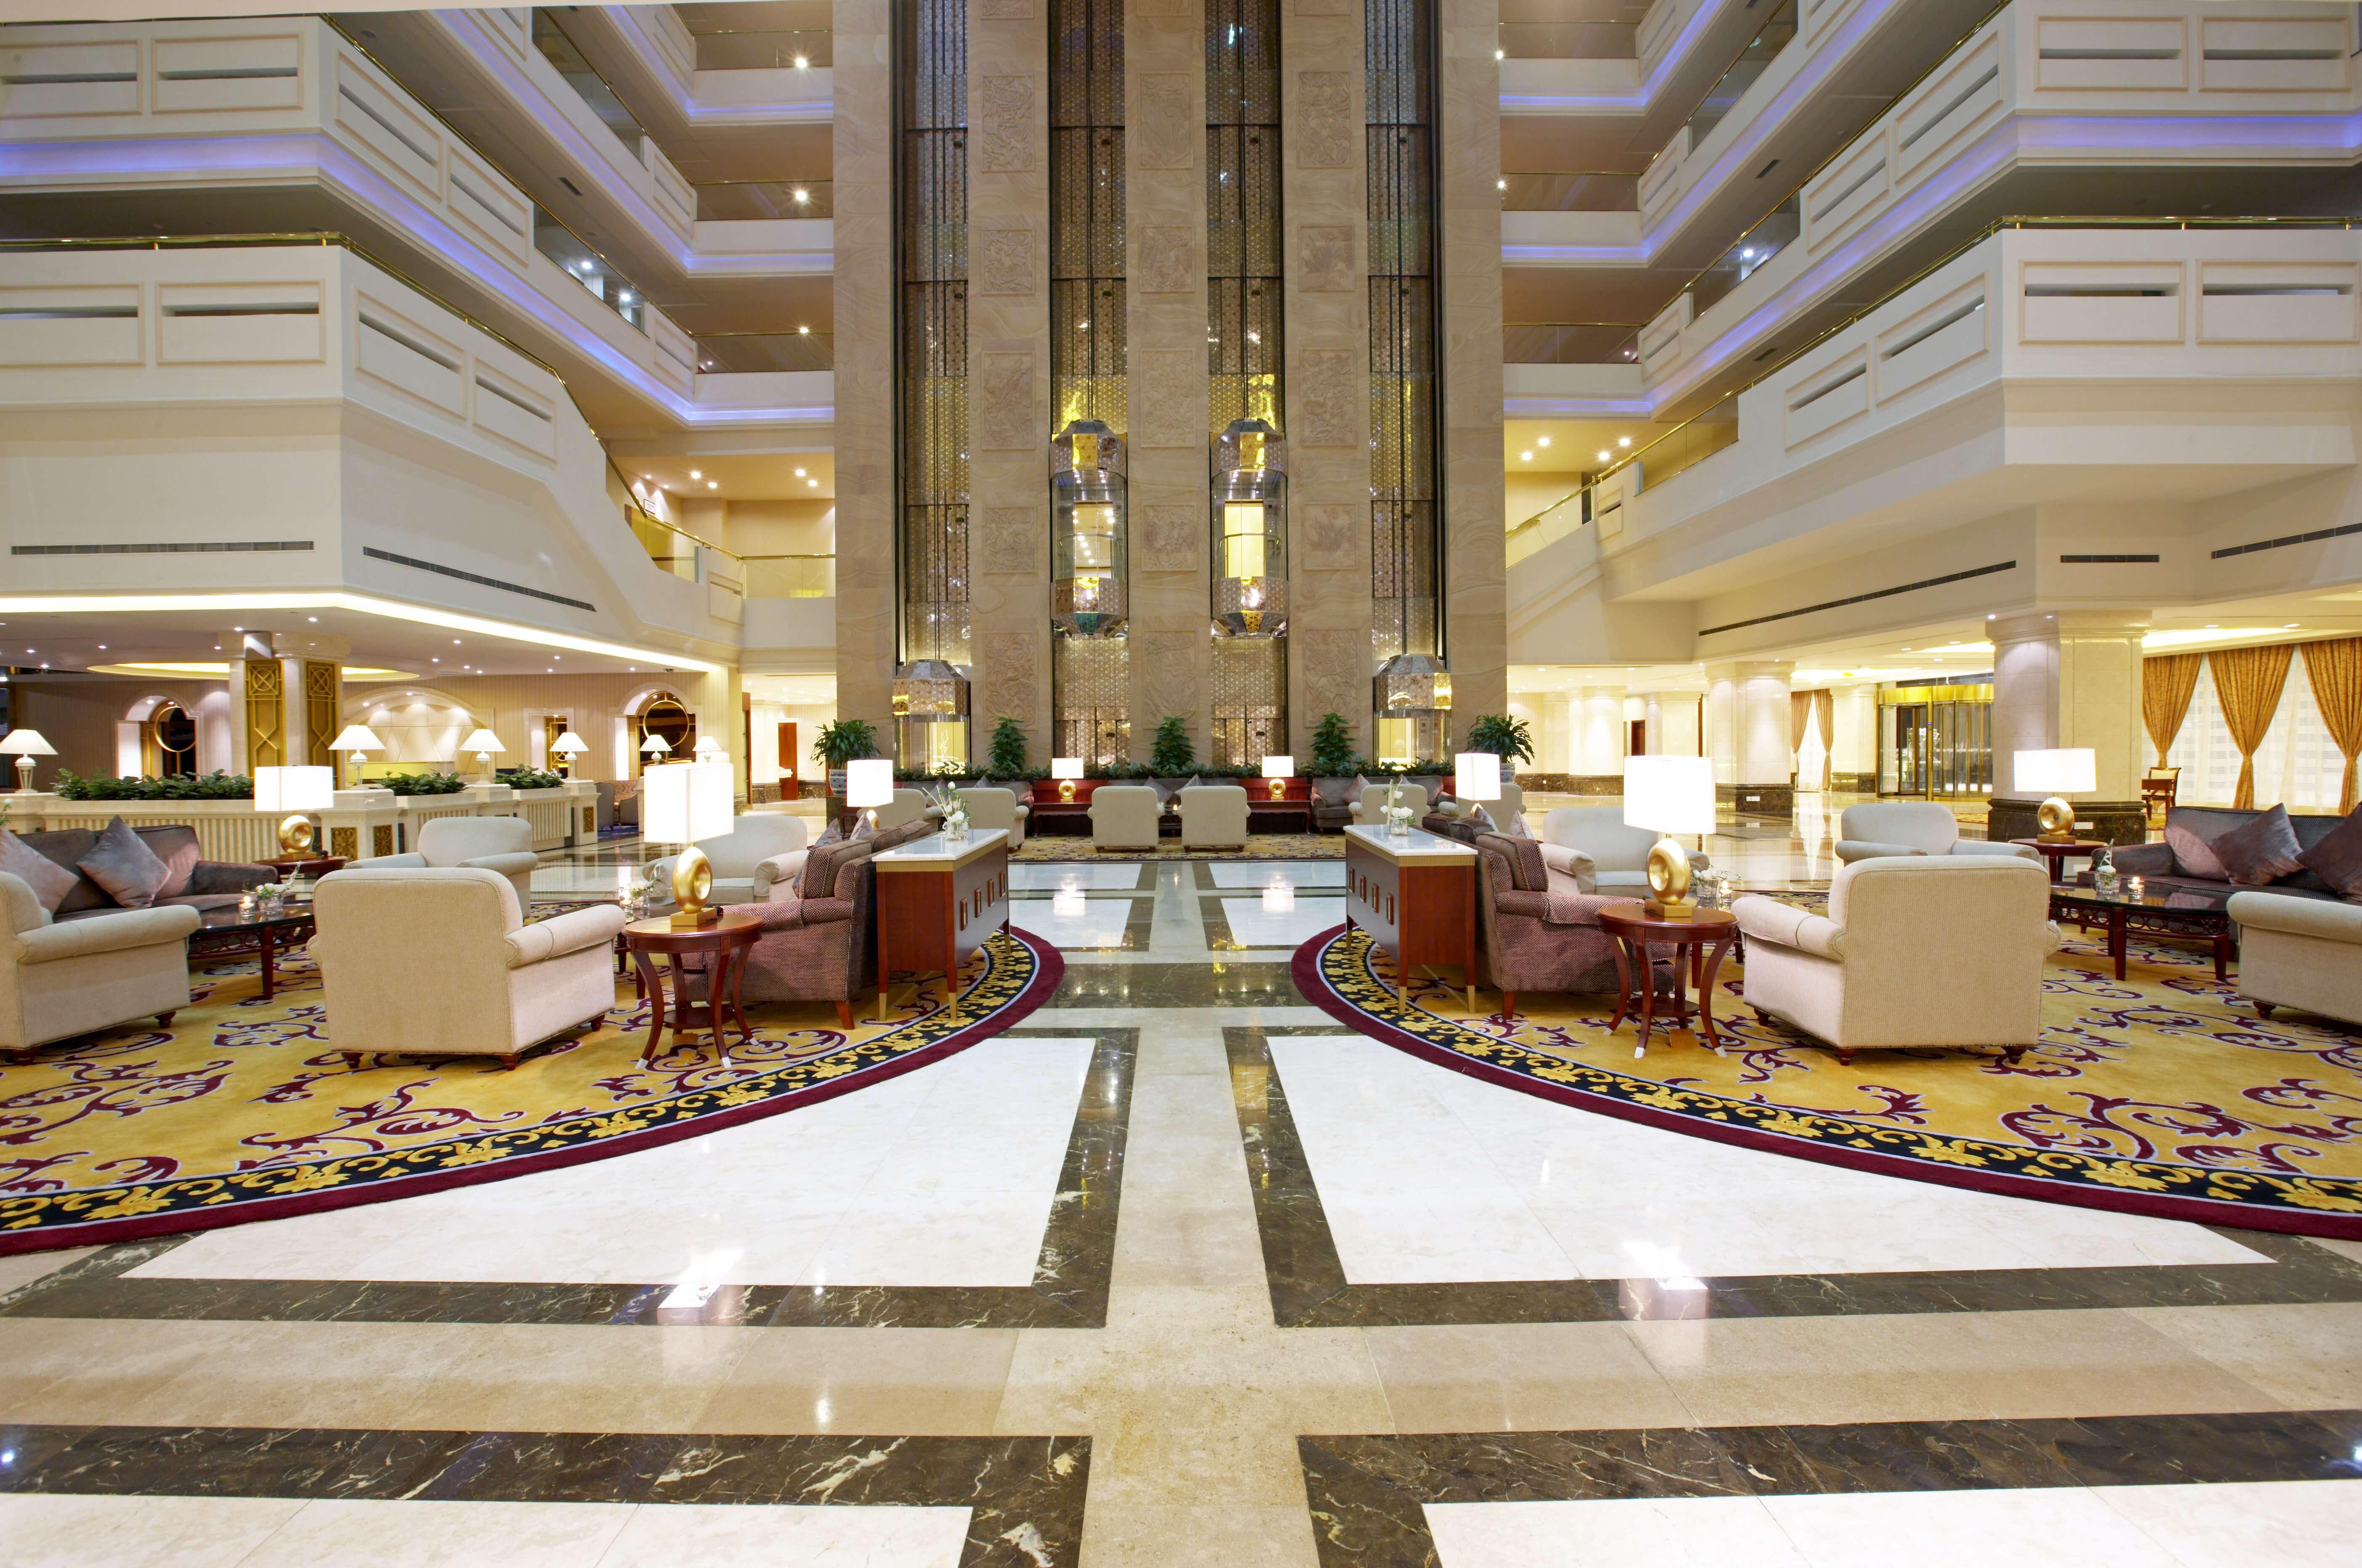 Sheraton Hotel, Guilin 2